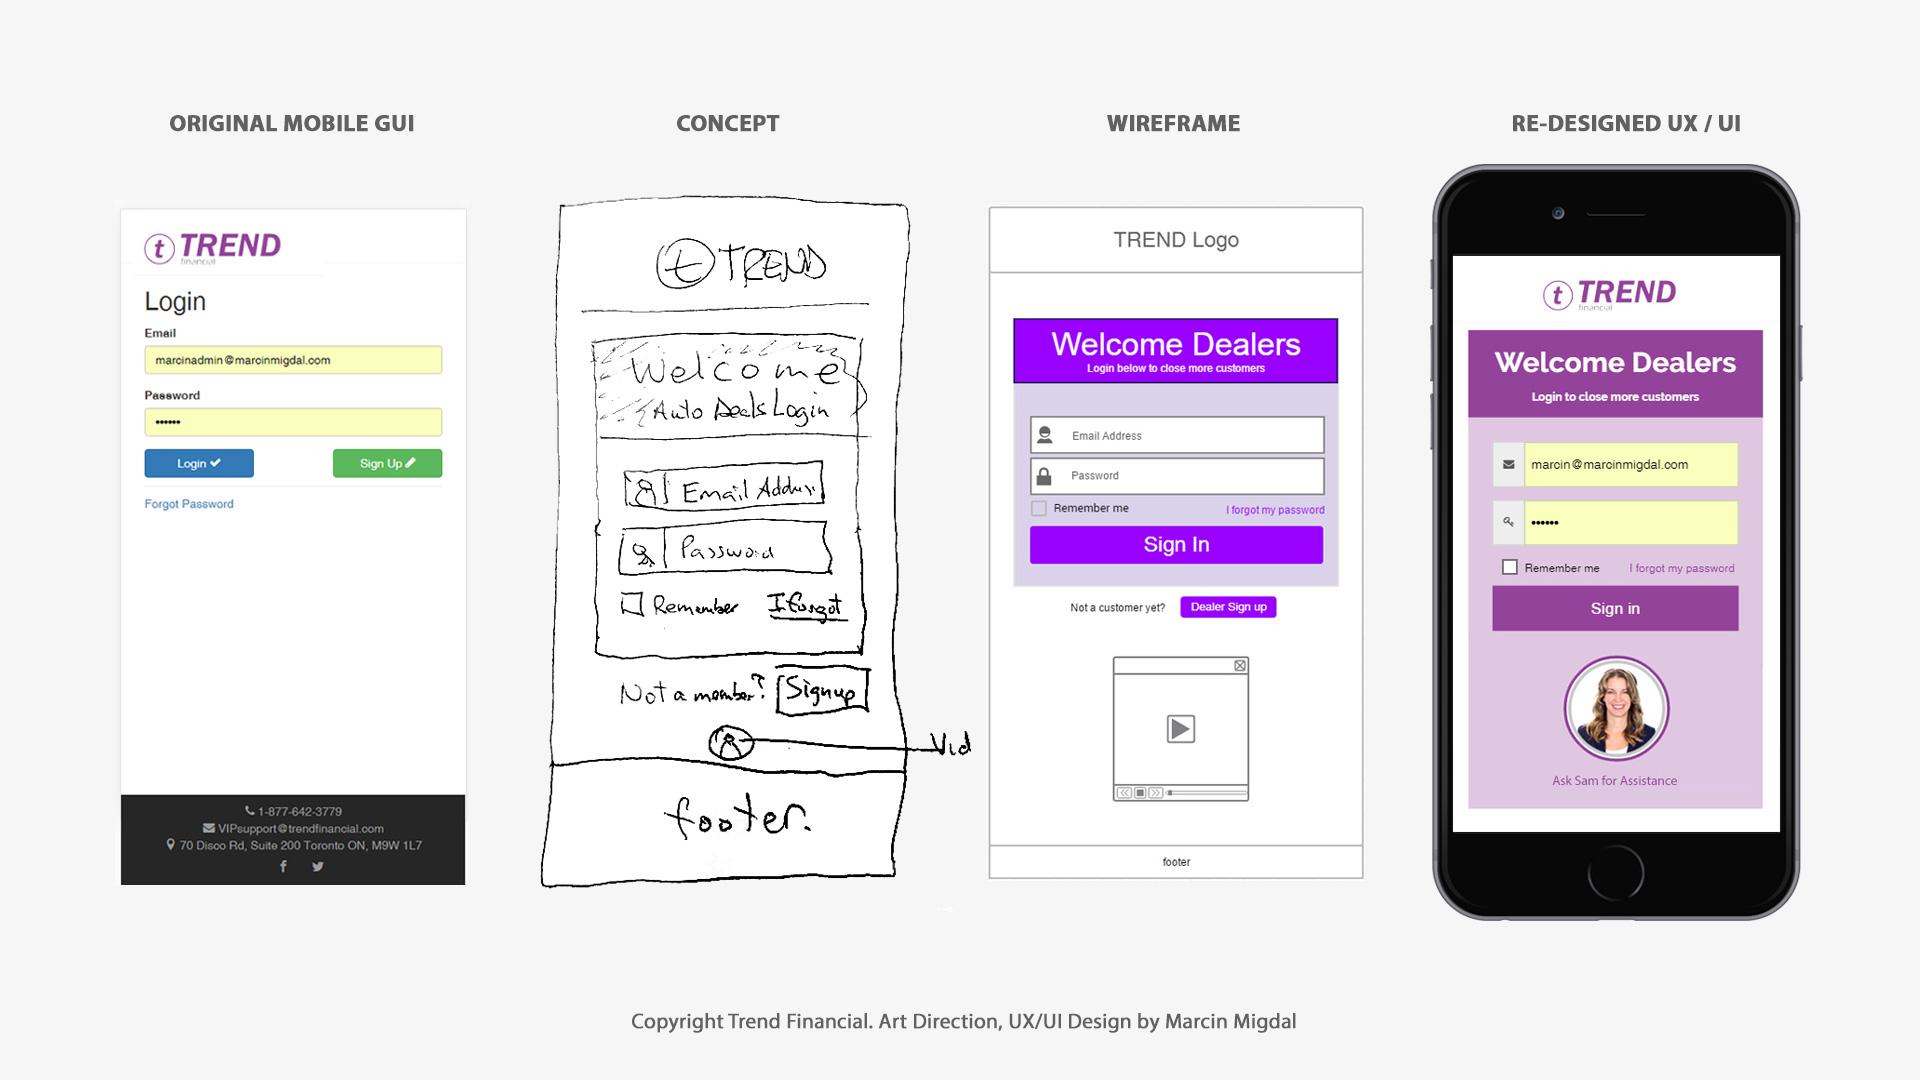 Marcin Migdal - Top UX / UI Designer in Toronto  Mobile